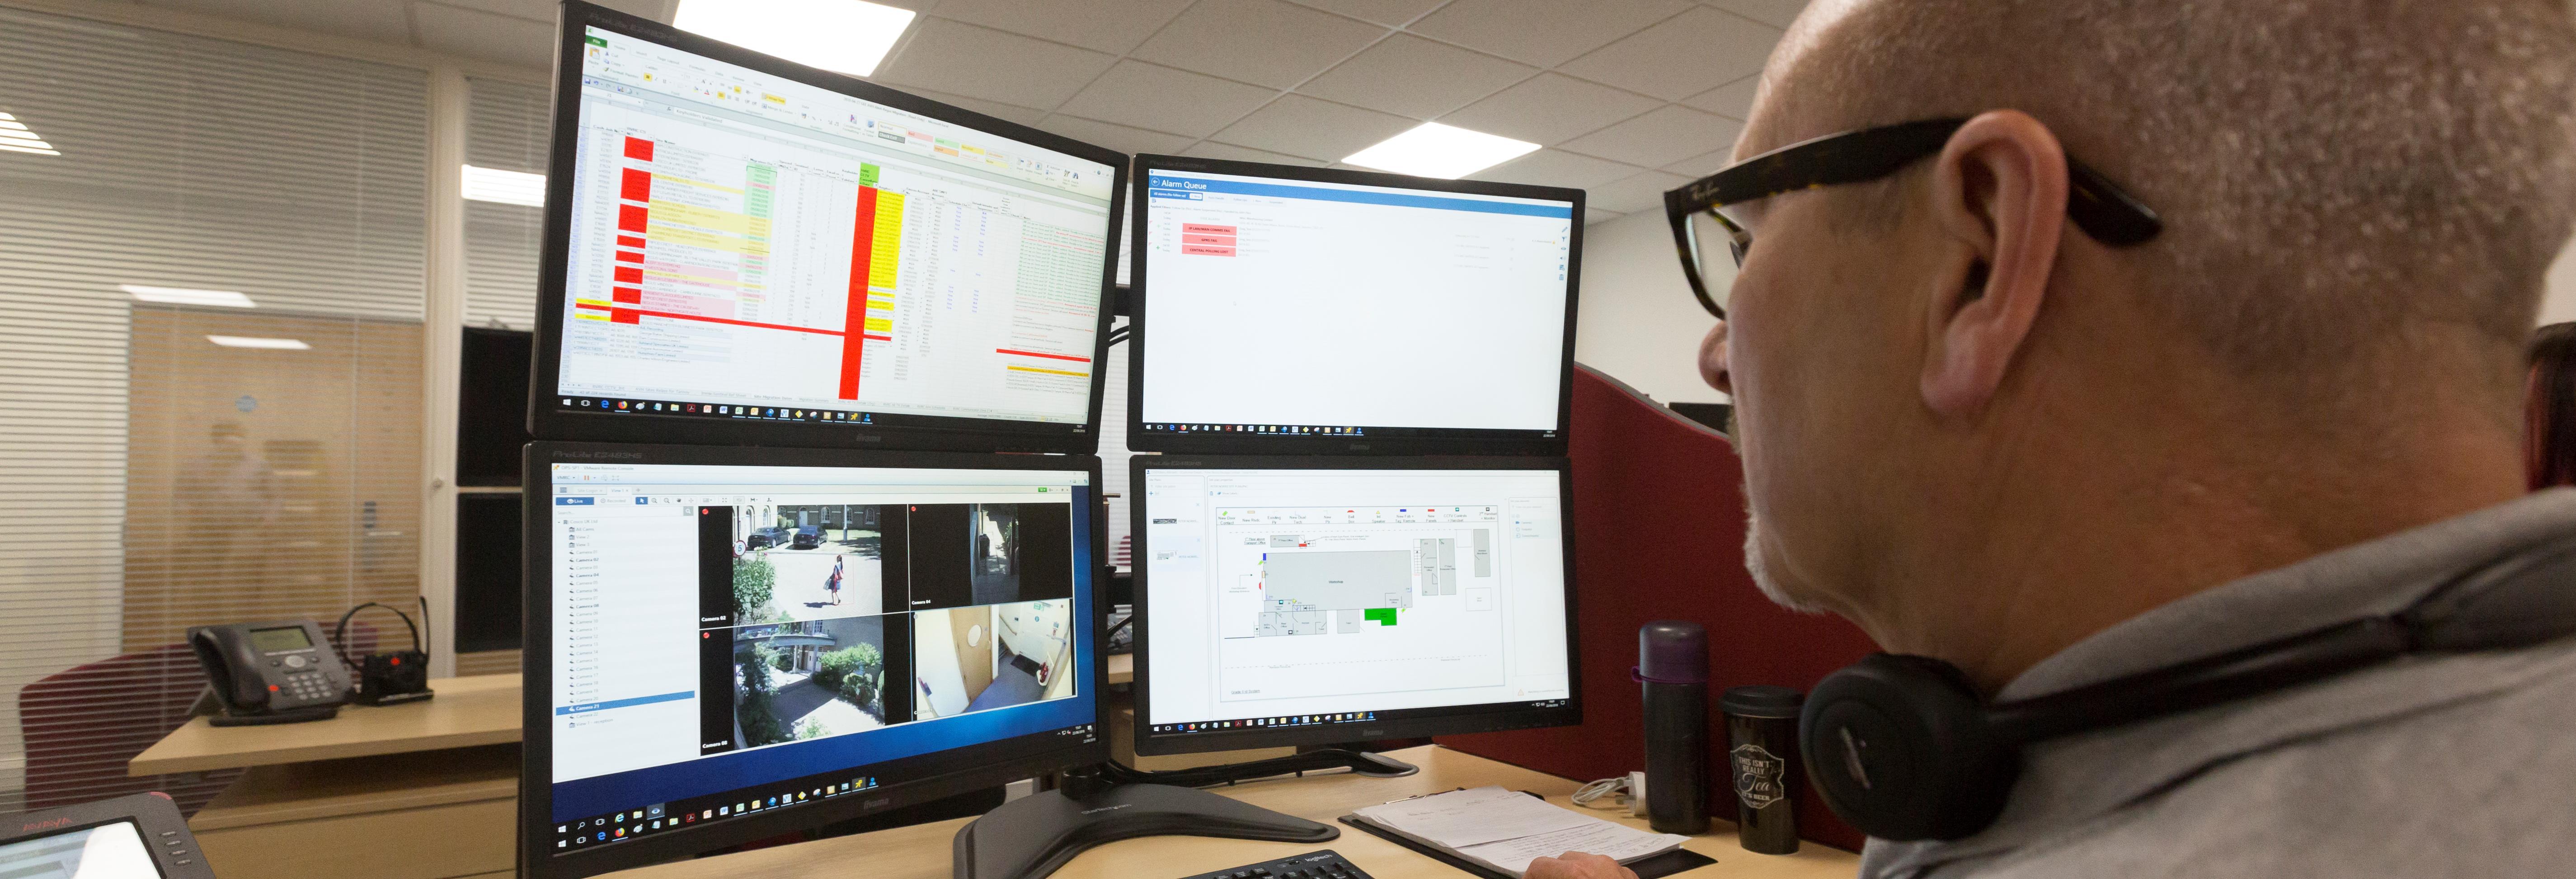 Operator Monitoring CCTV